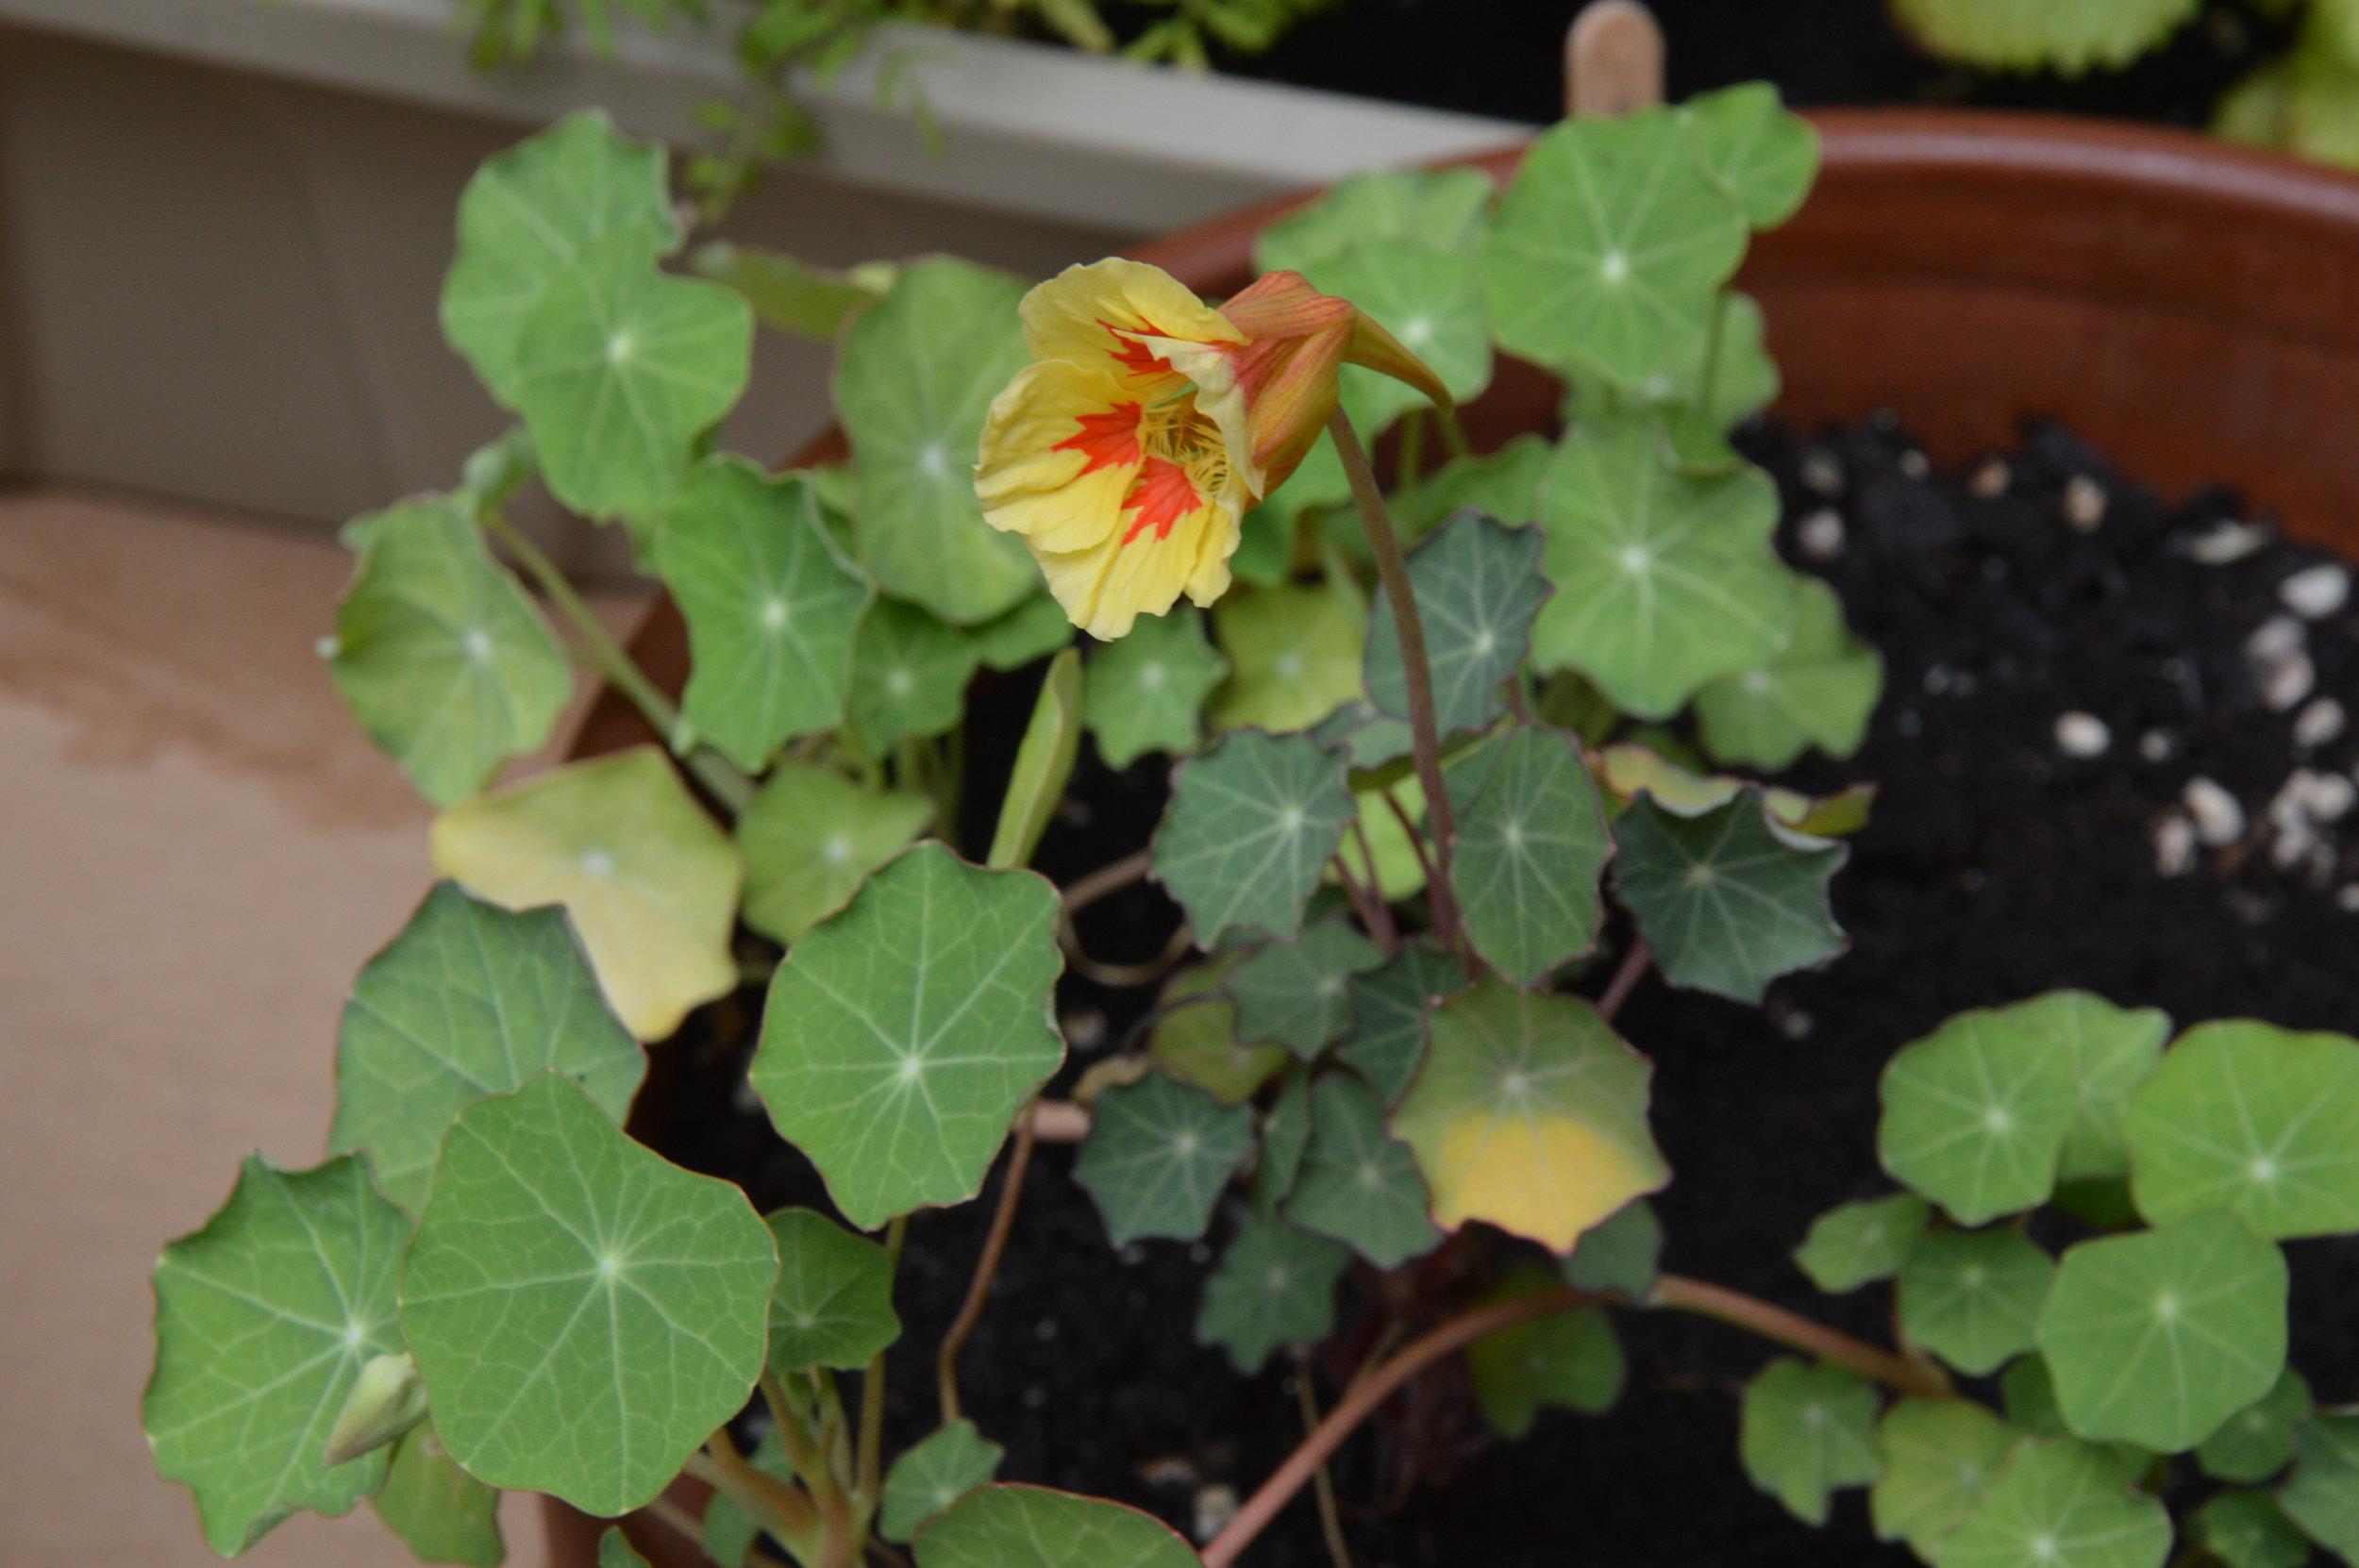 Fleurs de capucine / Nasturtium flowers